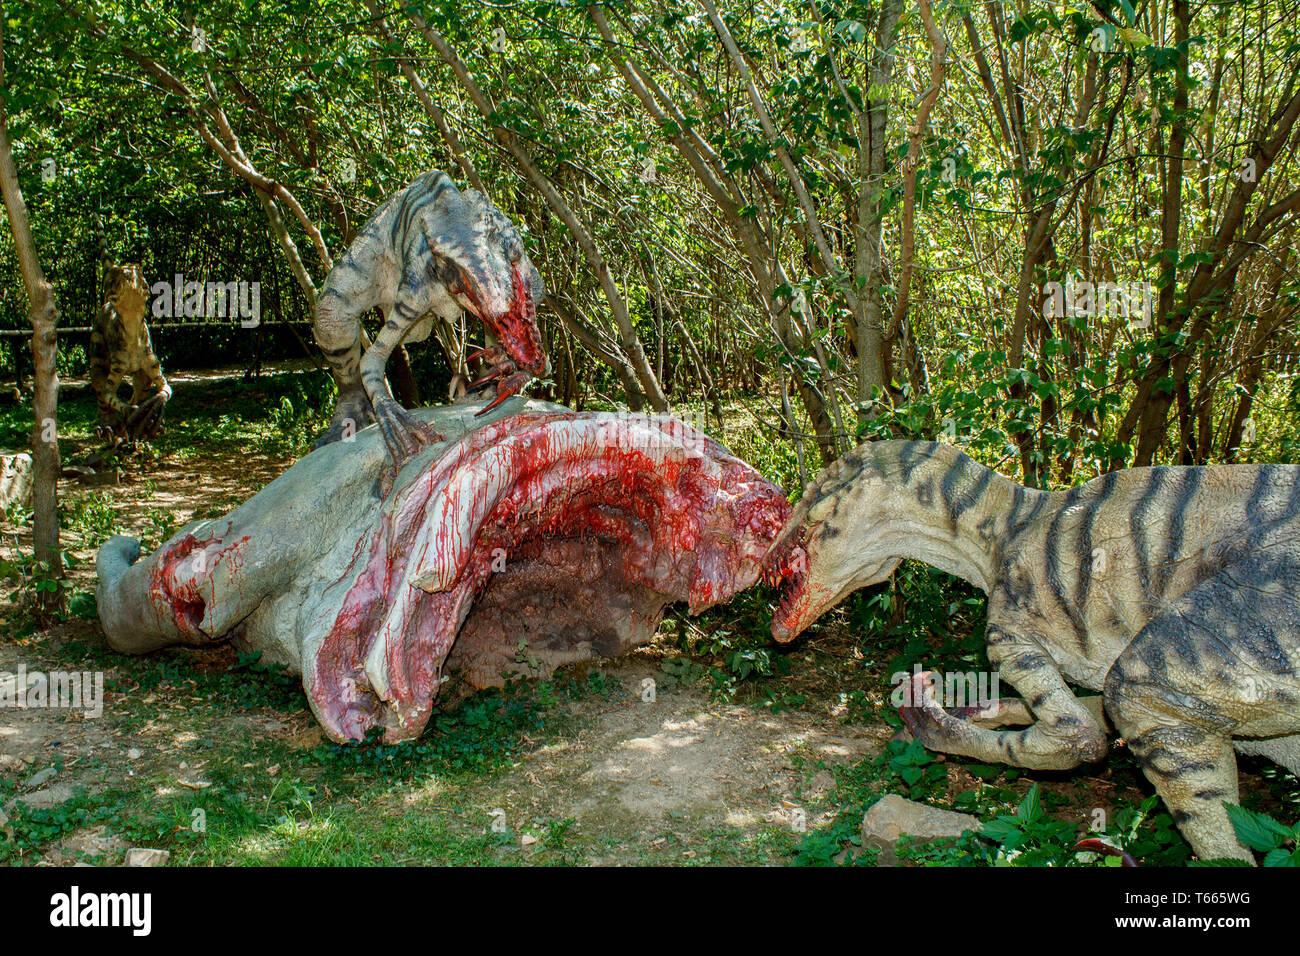 model of two raptors eating pray - Stock Image